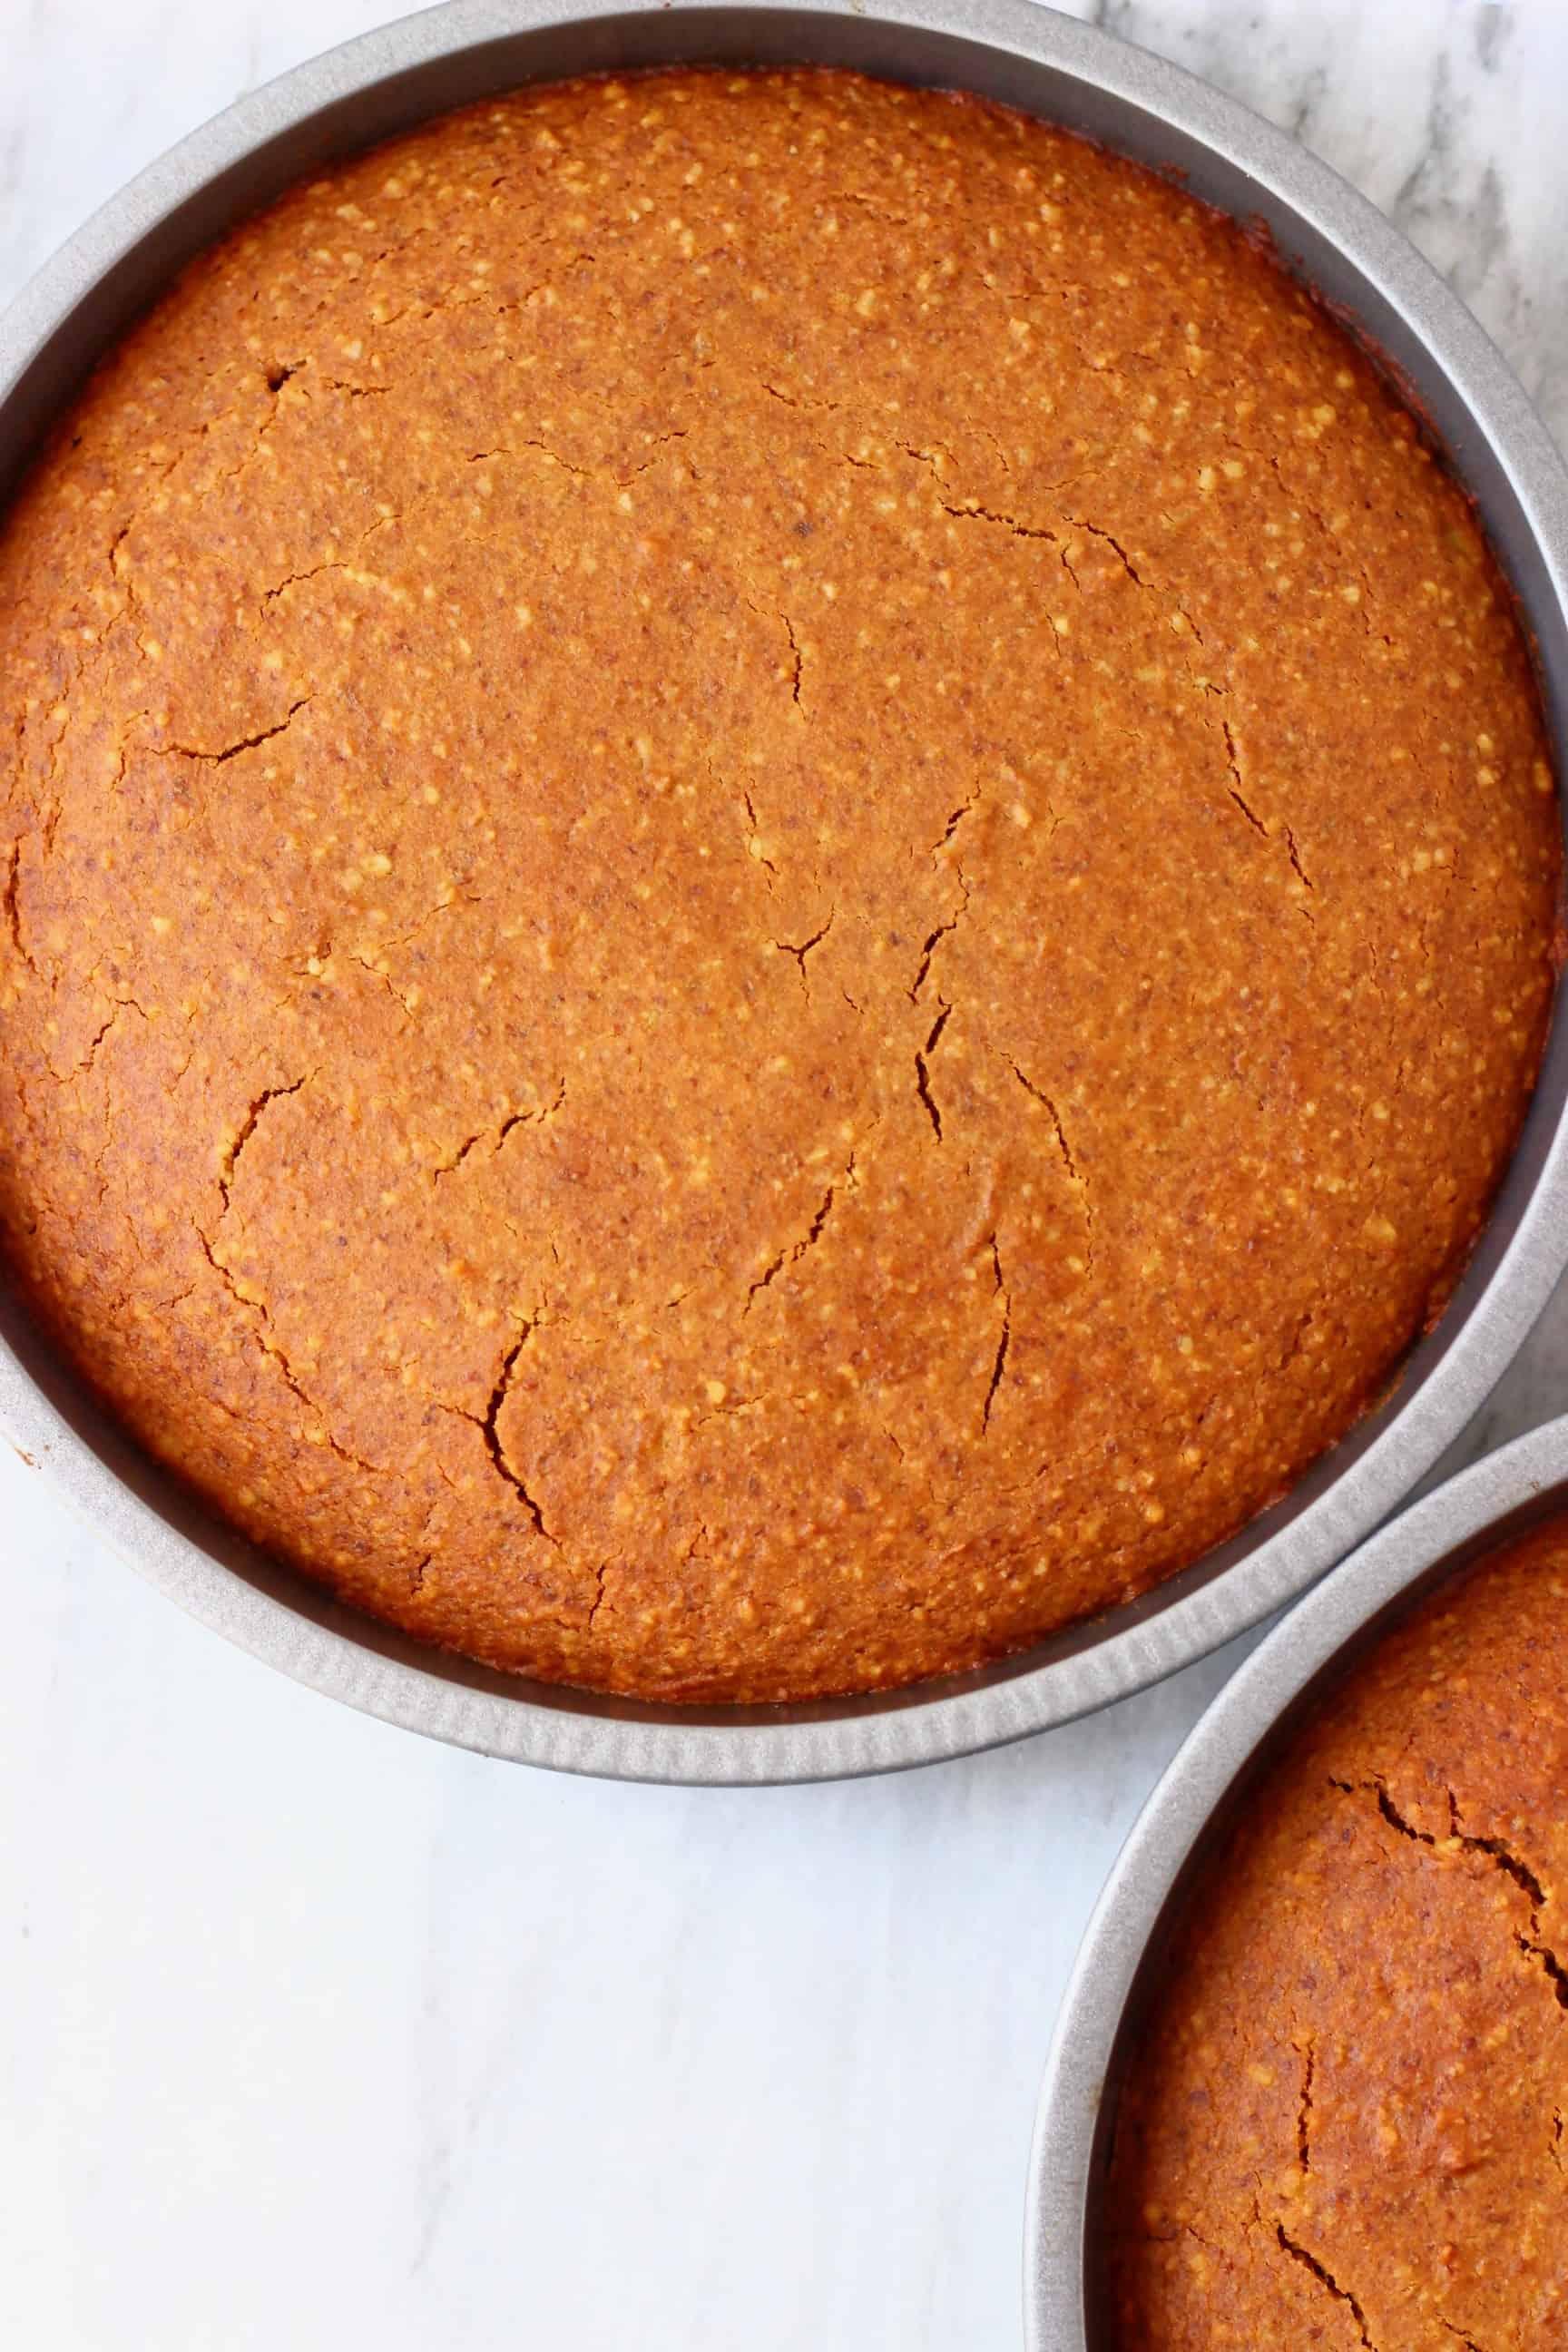 Gluten-free vegan coffee cake sponges in two round baking tins